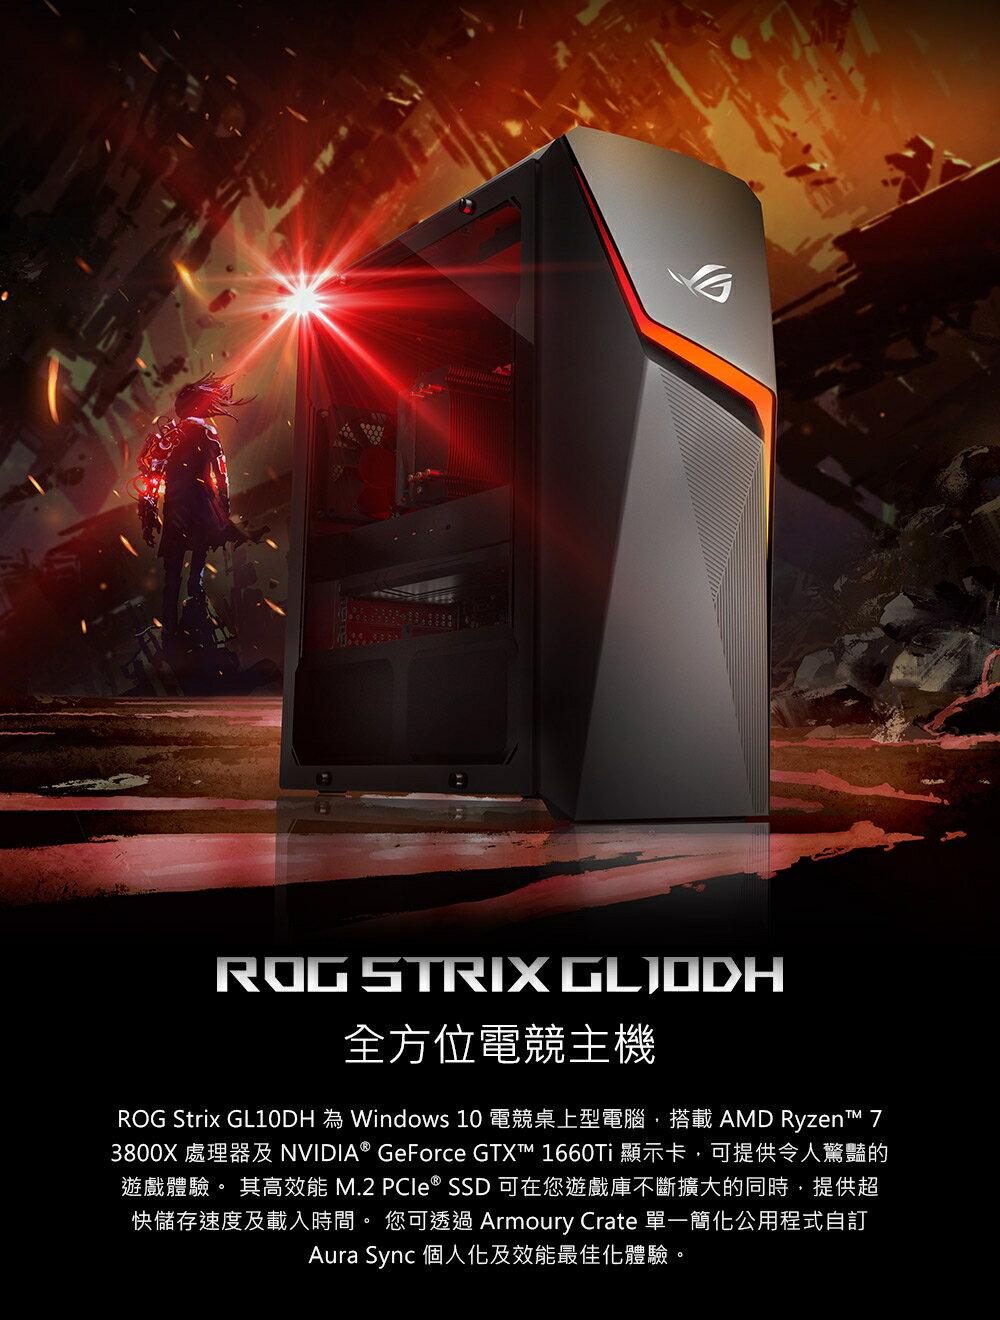 ASUS ROG Strix GL10DH 八核獨顯電競桌上型電腦